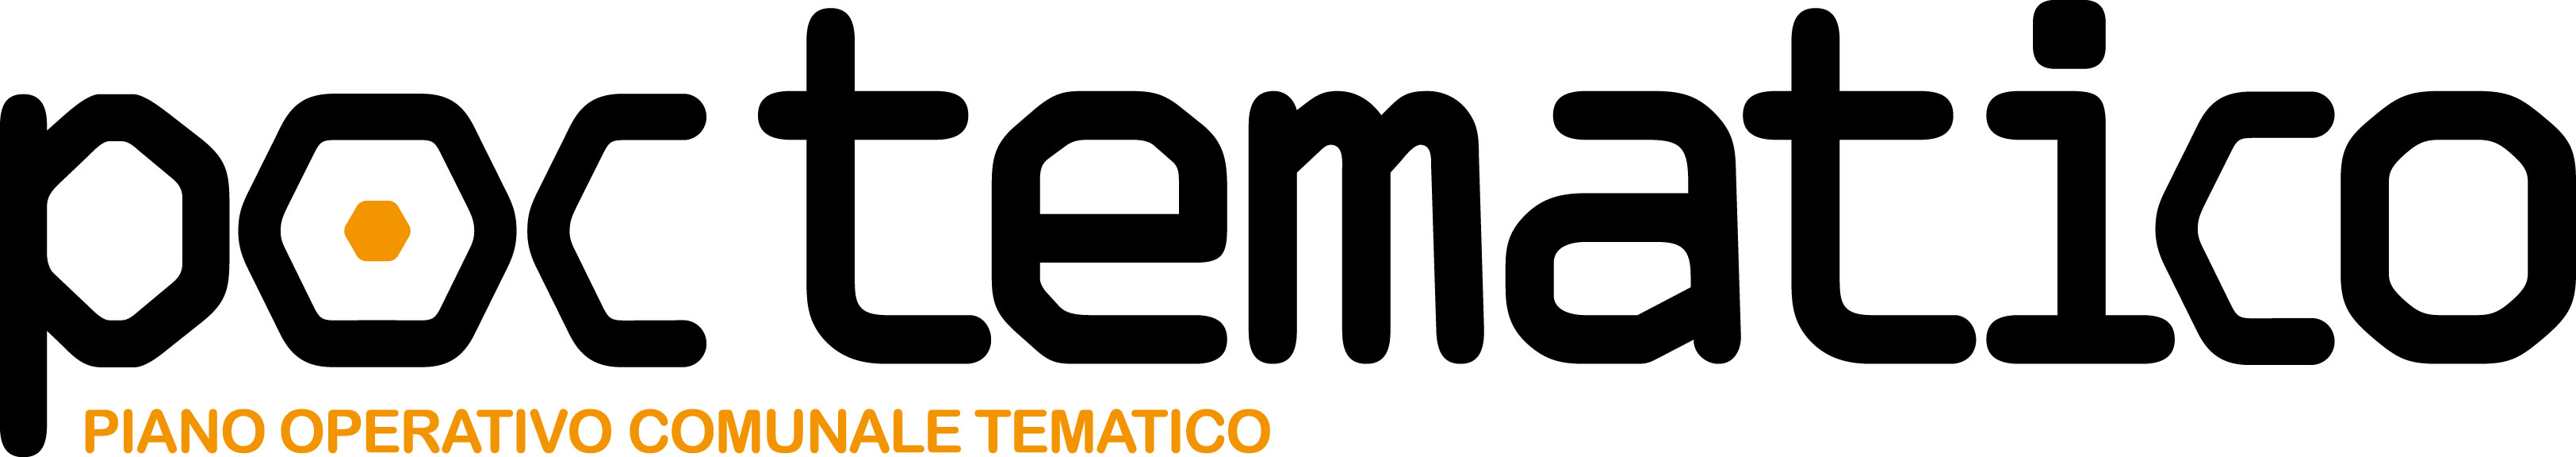 logo POC tematico.jpg